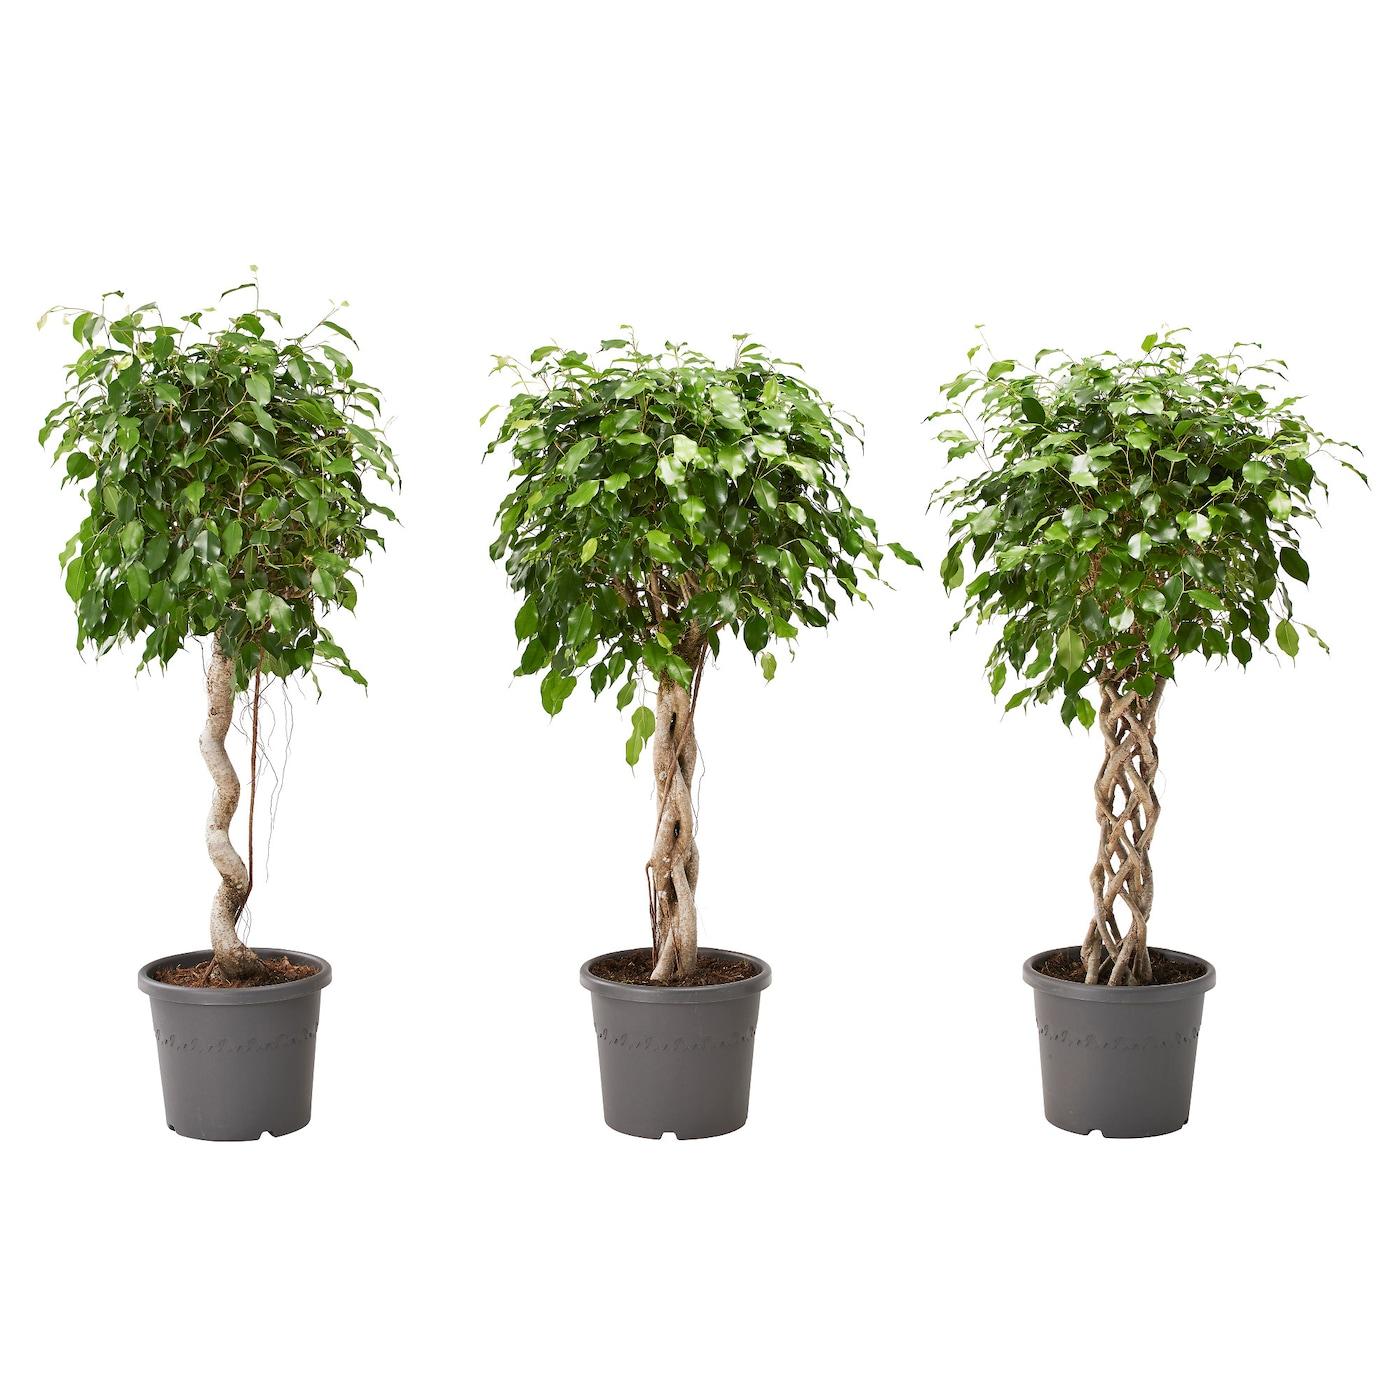 Ikea Ficus Benjamina Potted Plant